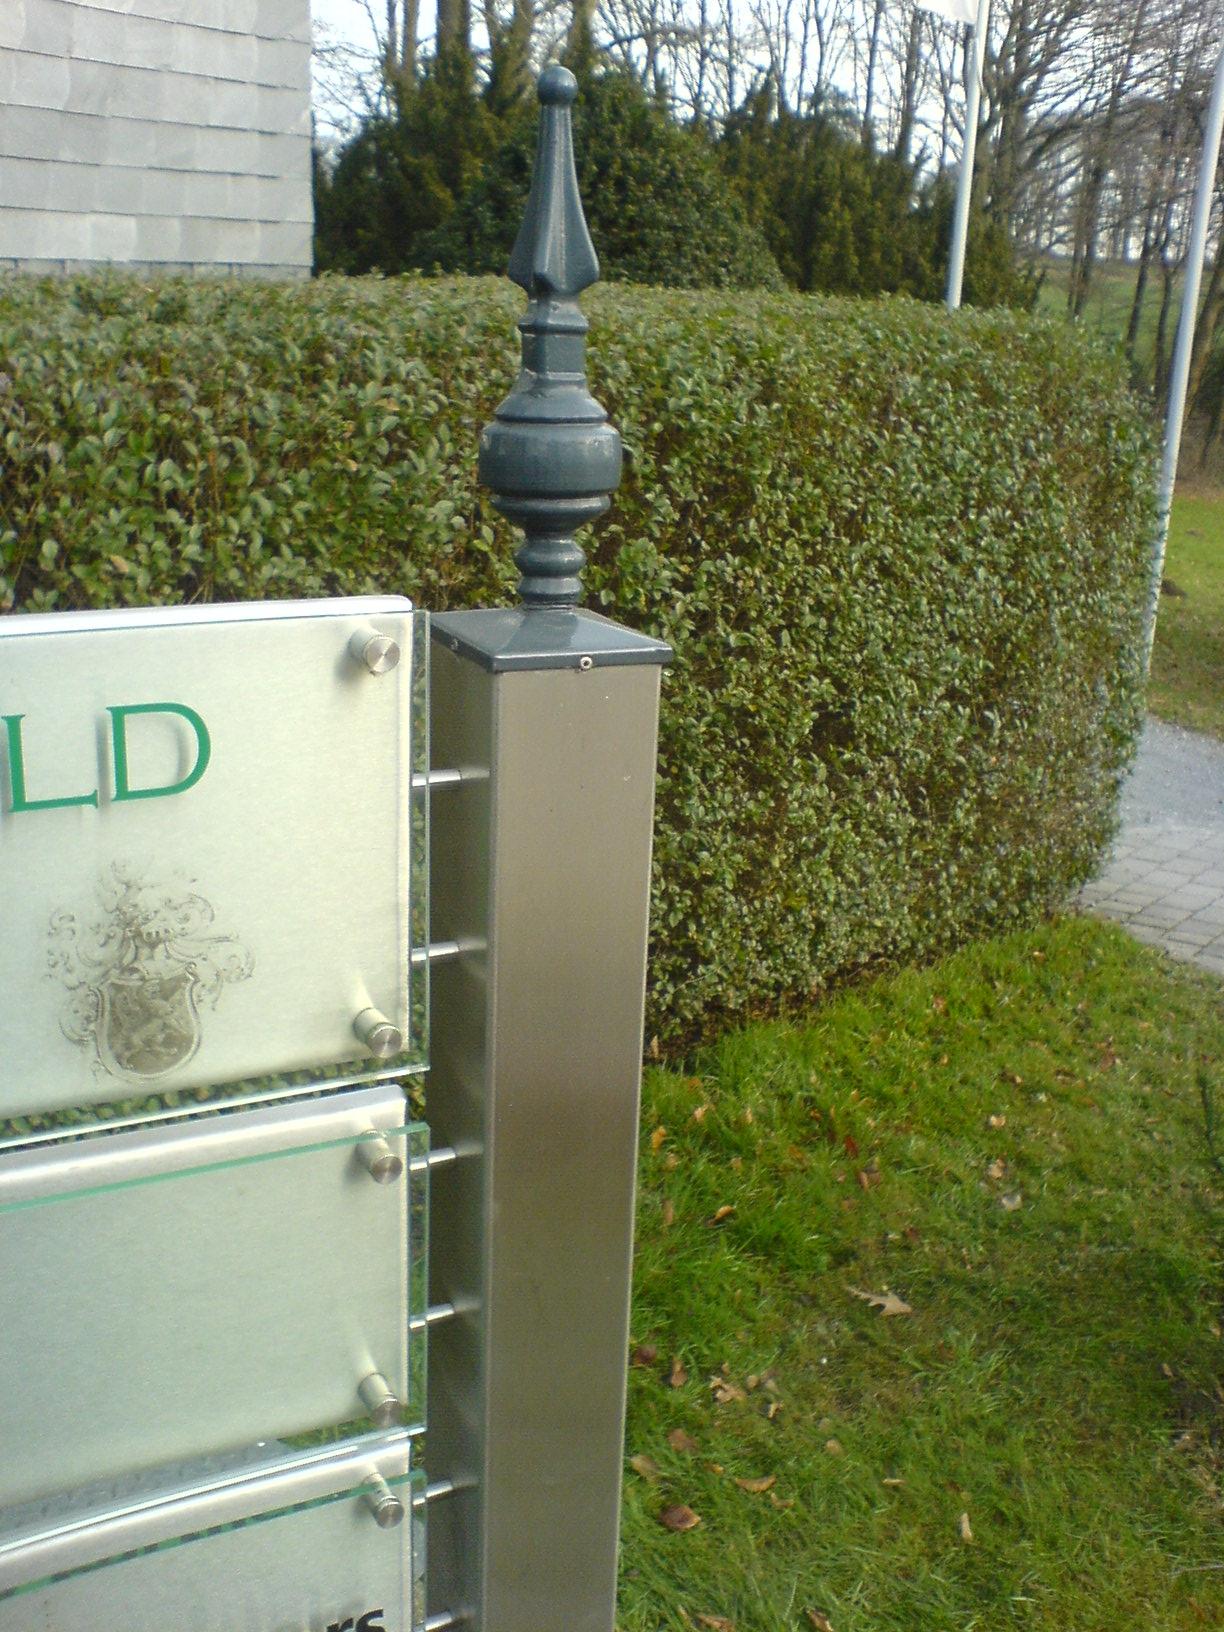 Metallbau wuppertal gel nder rustikal und modern for Rustikal modern